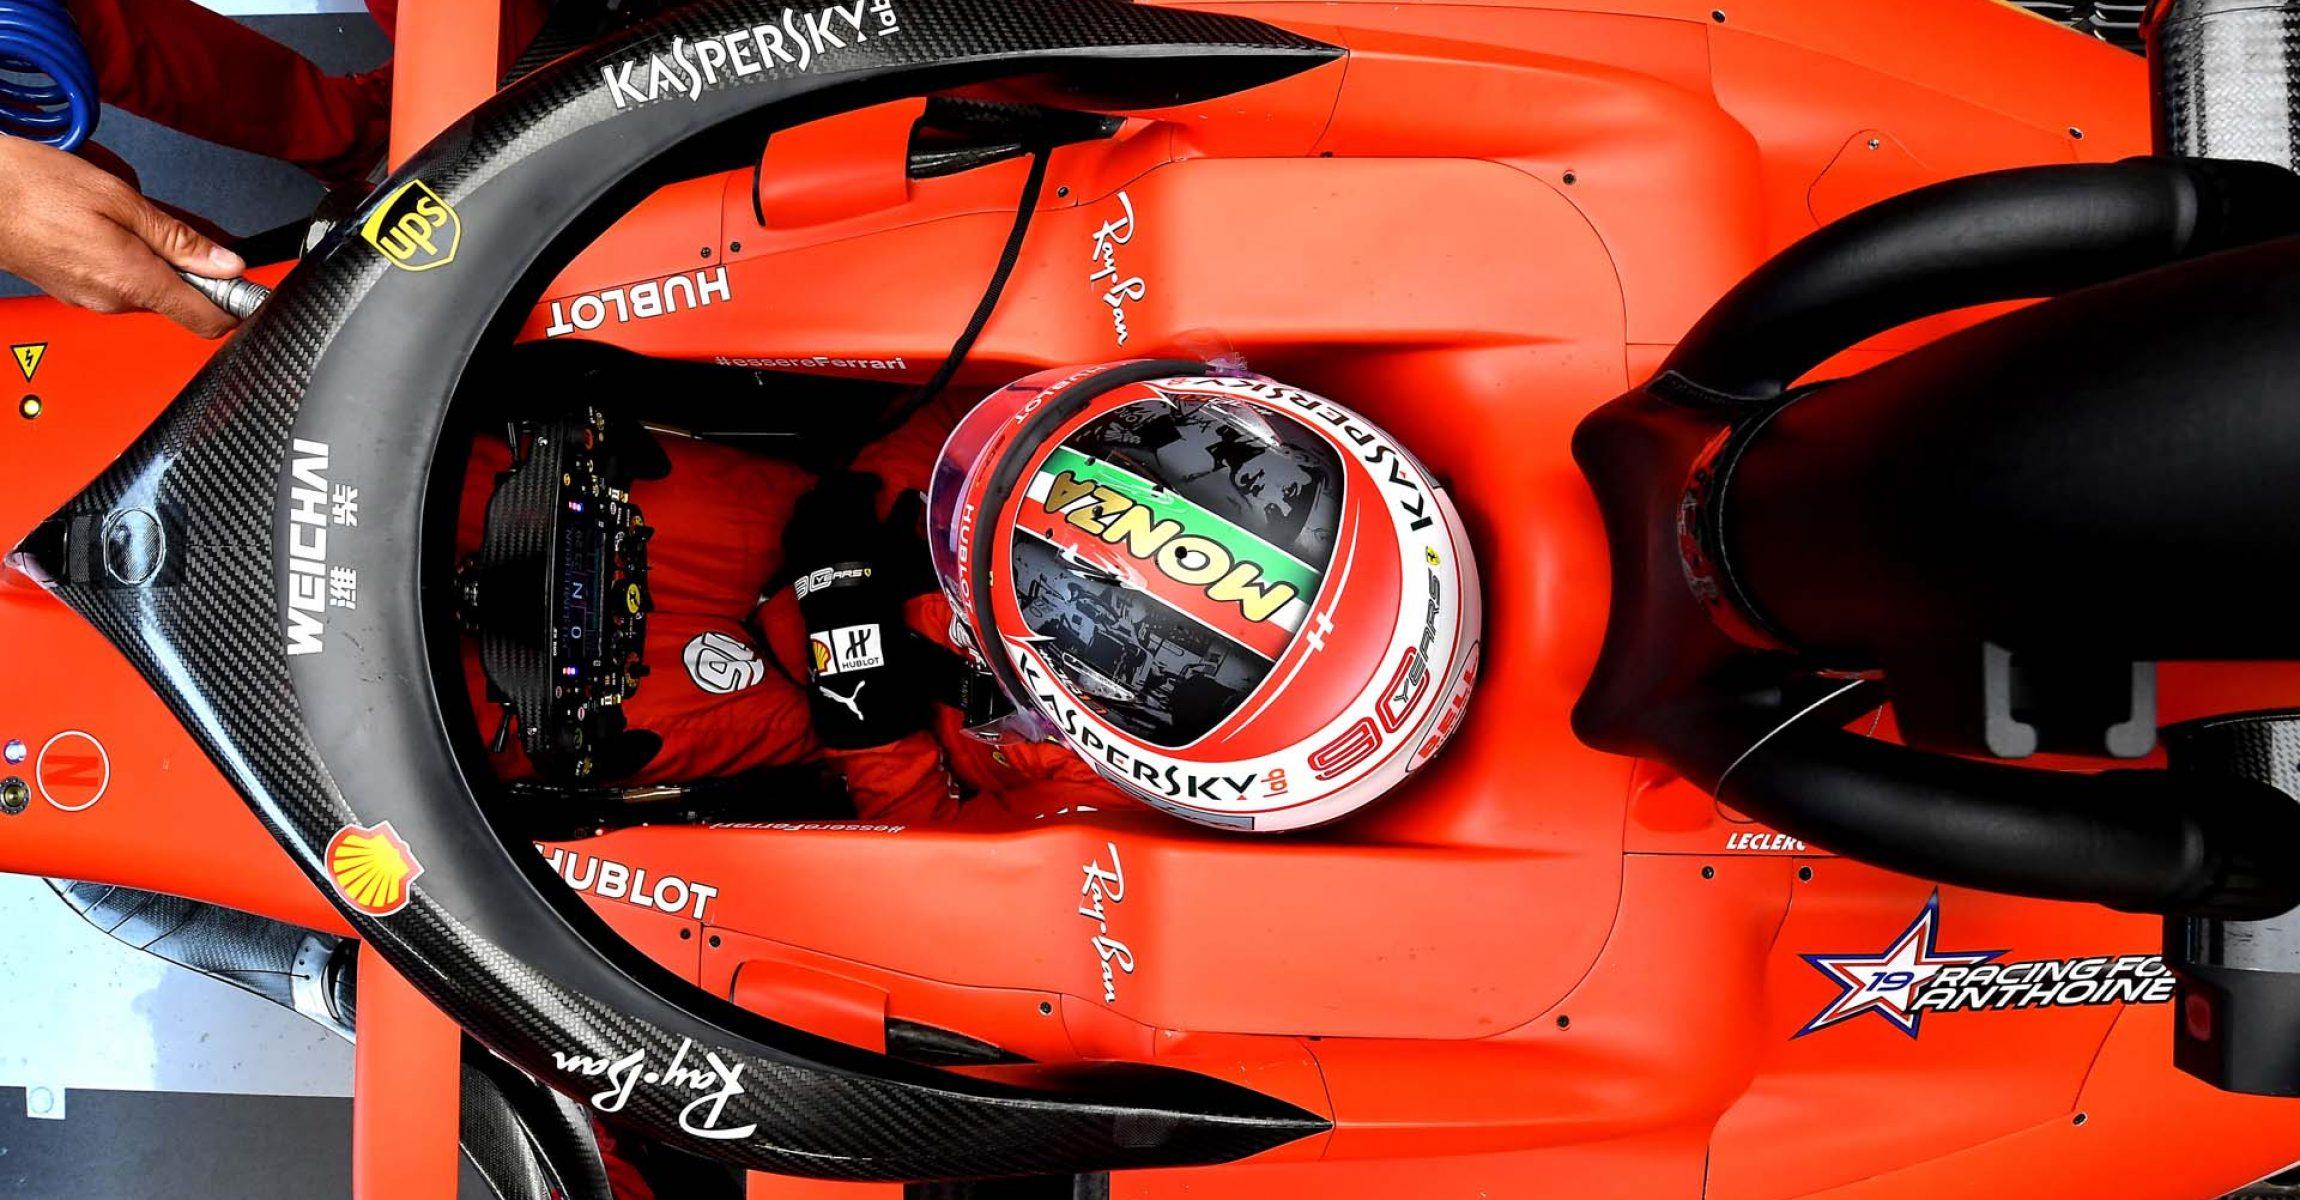 GP ITALIA F1/2019 - VENERDI 06/09/2019 credit: @Scuderia Ferrari Press Office Charles Leclerc, Ferrari Italy, Italian Grand Prix 2019, Monza,